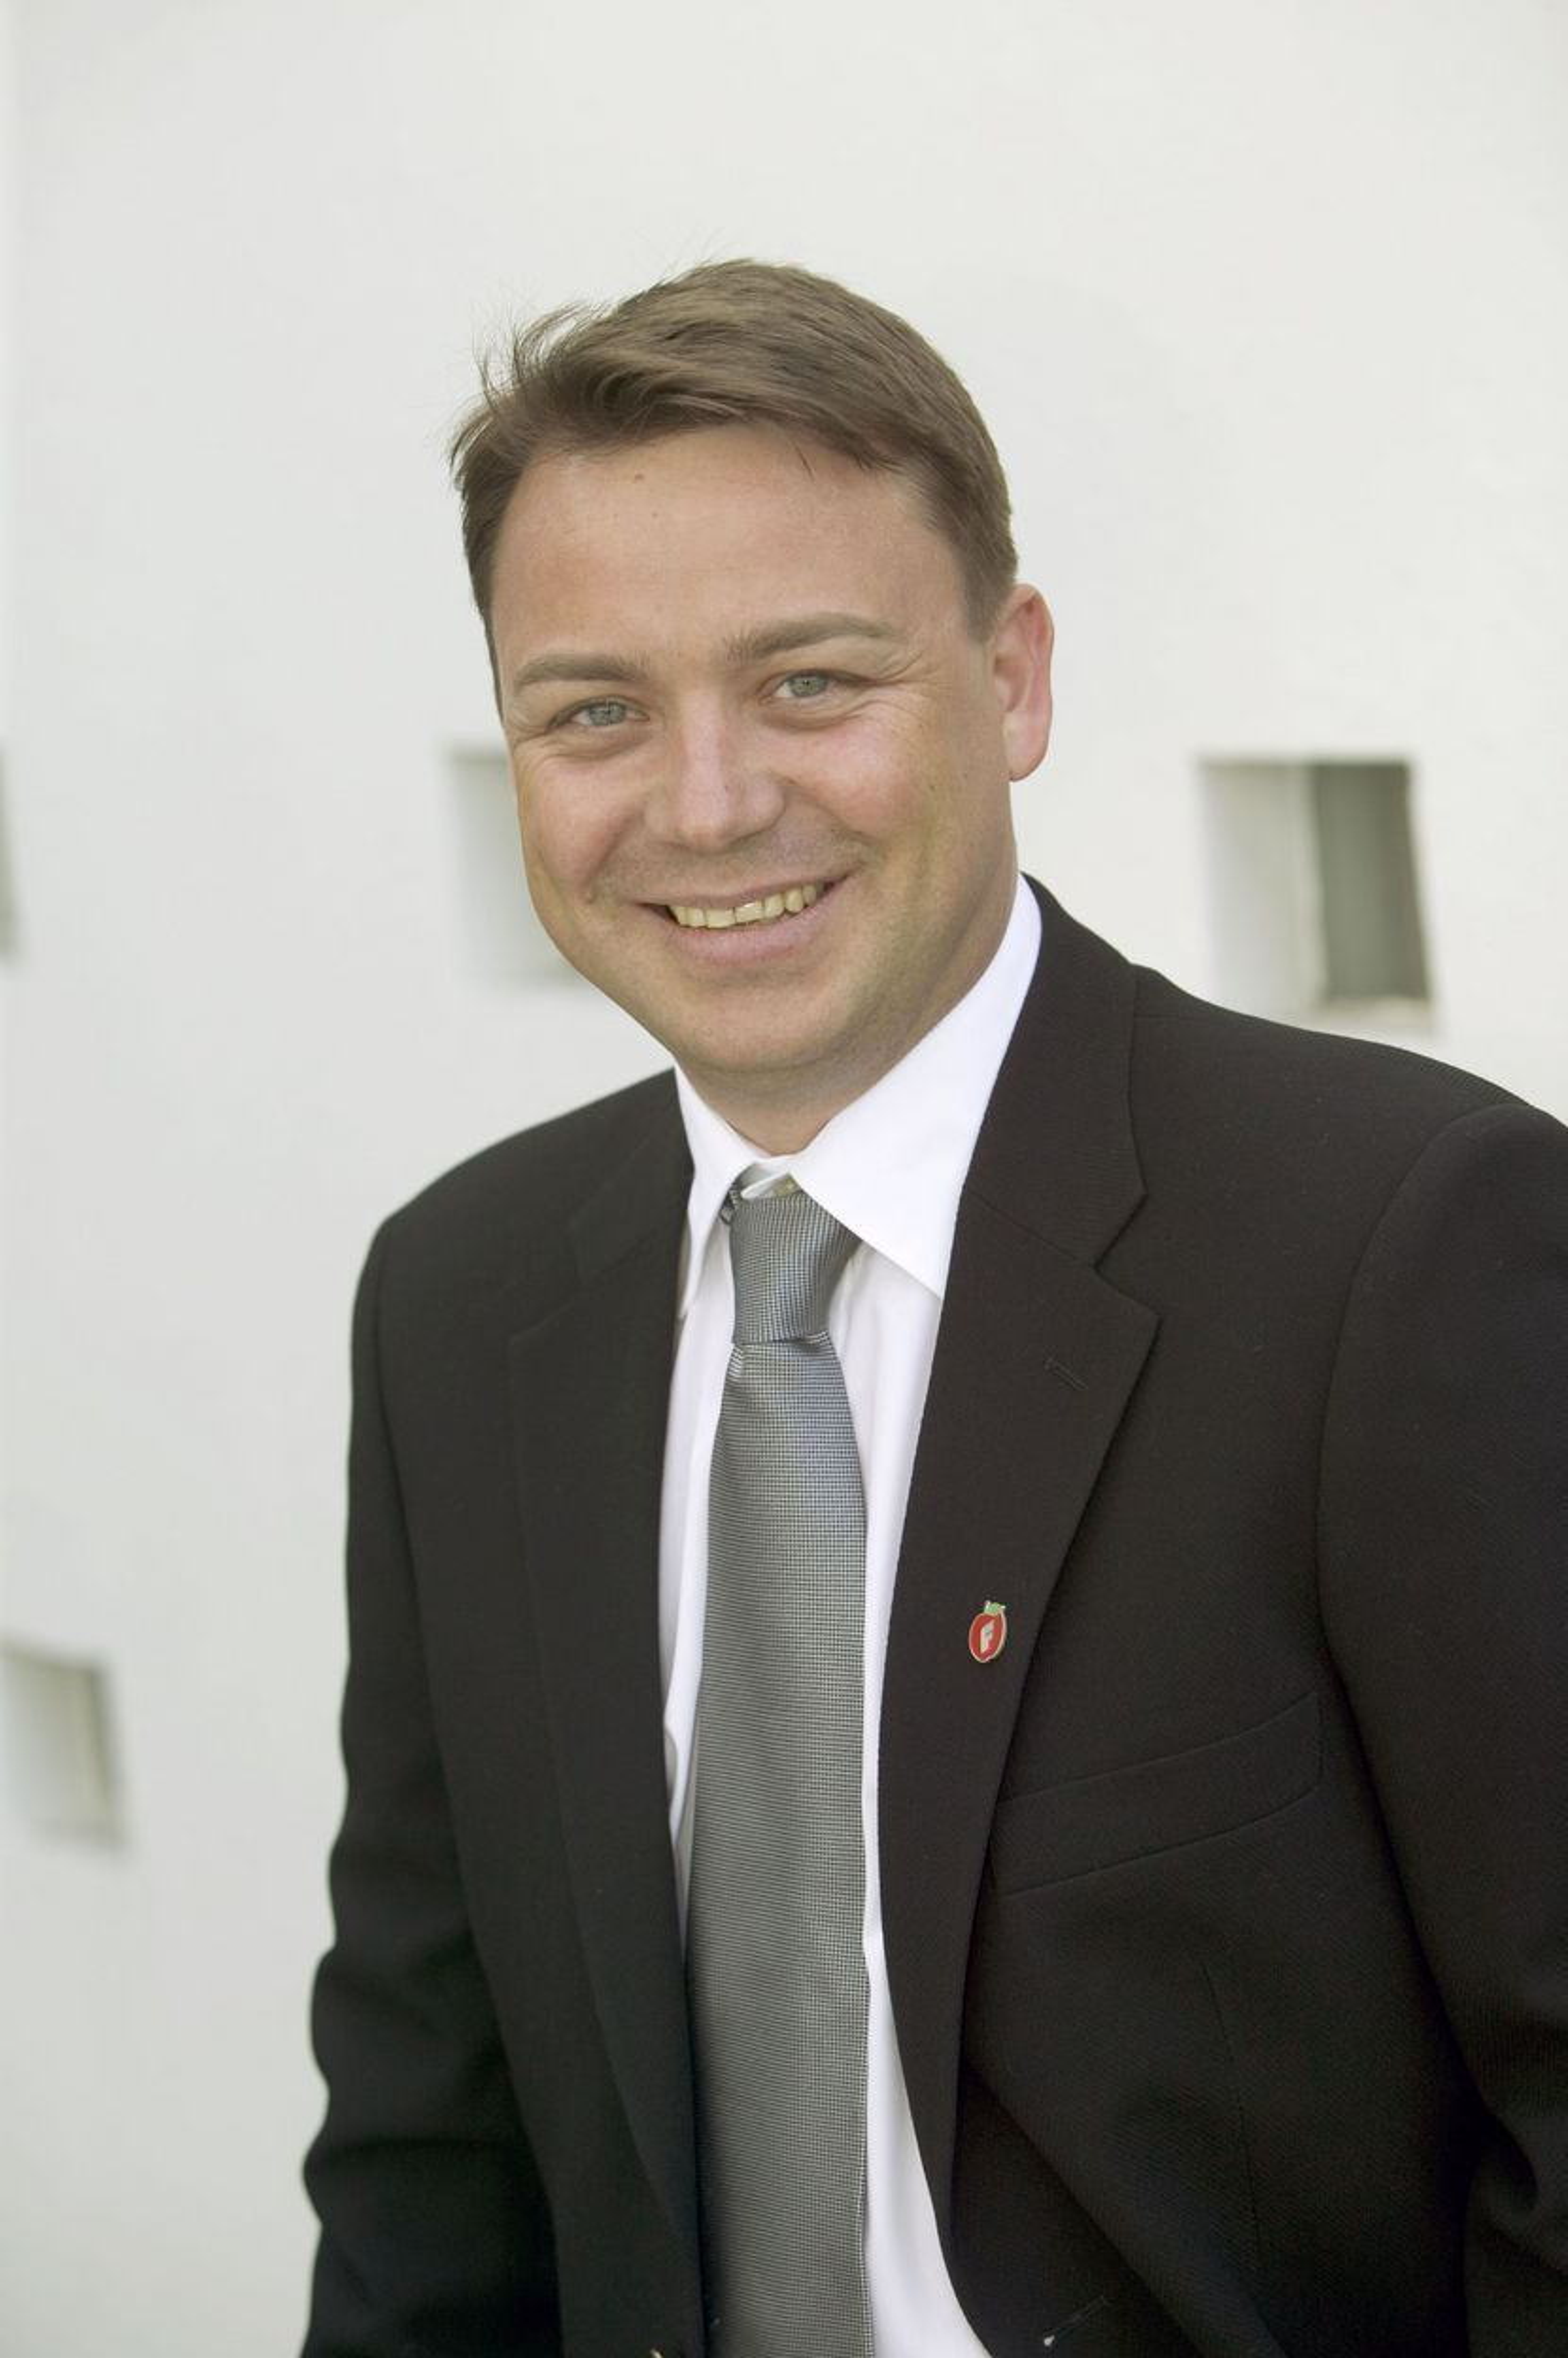 LITE ATTRAKTIVT: Fremskrittpartiets industripolitiske talsmann og medlem i Stortingets næringskomitè, Kåre Fostervold, mener nyinvesteringer i industrien i Øst-Norge er lite attraktive fordi energitilgangen kan bli for liten.